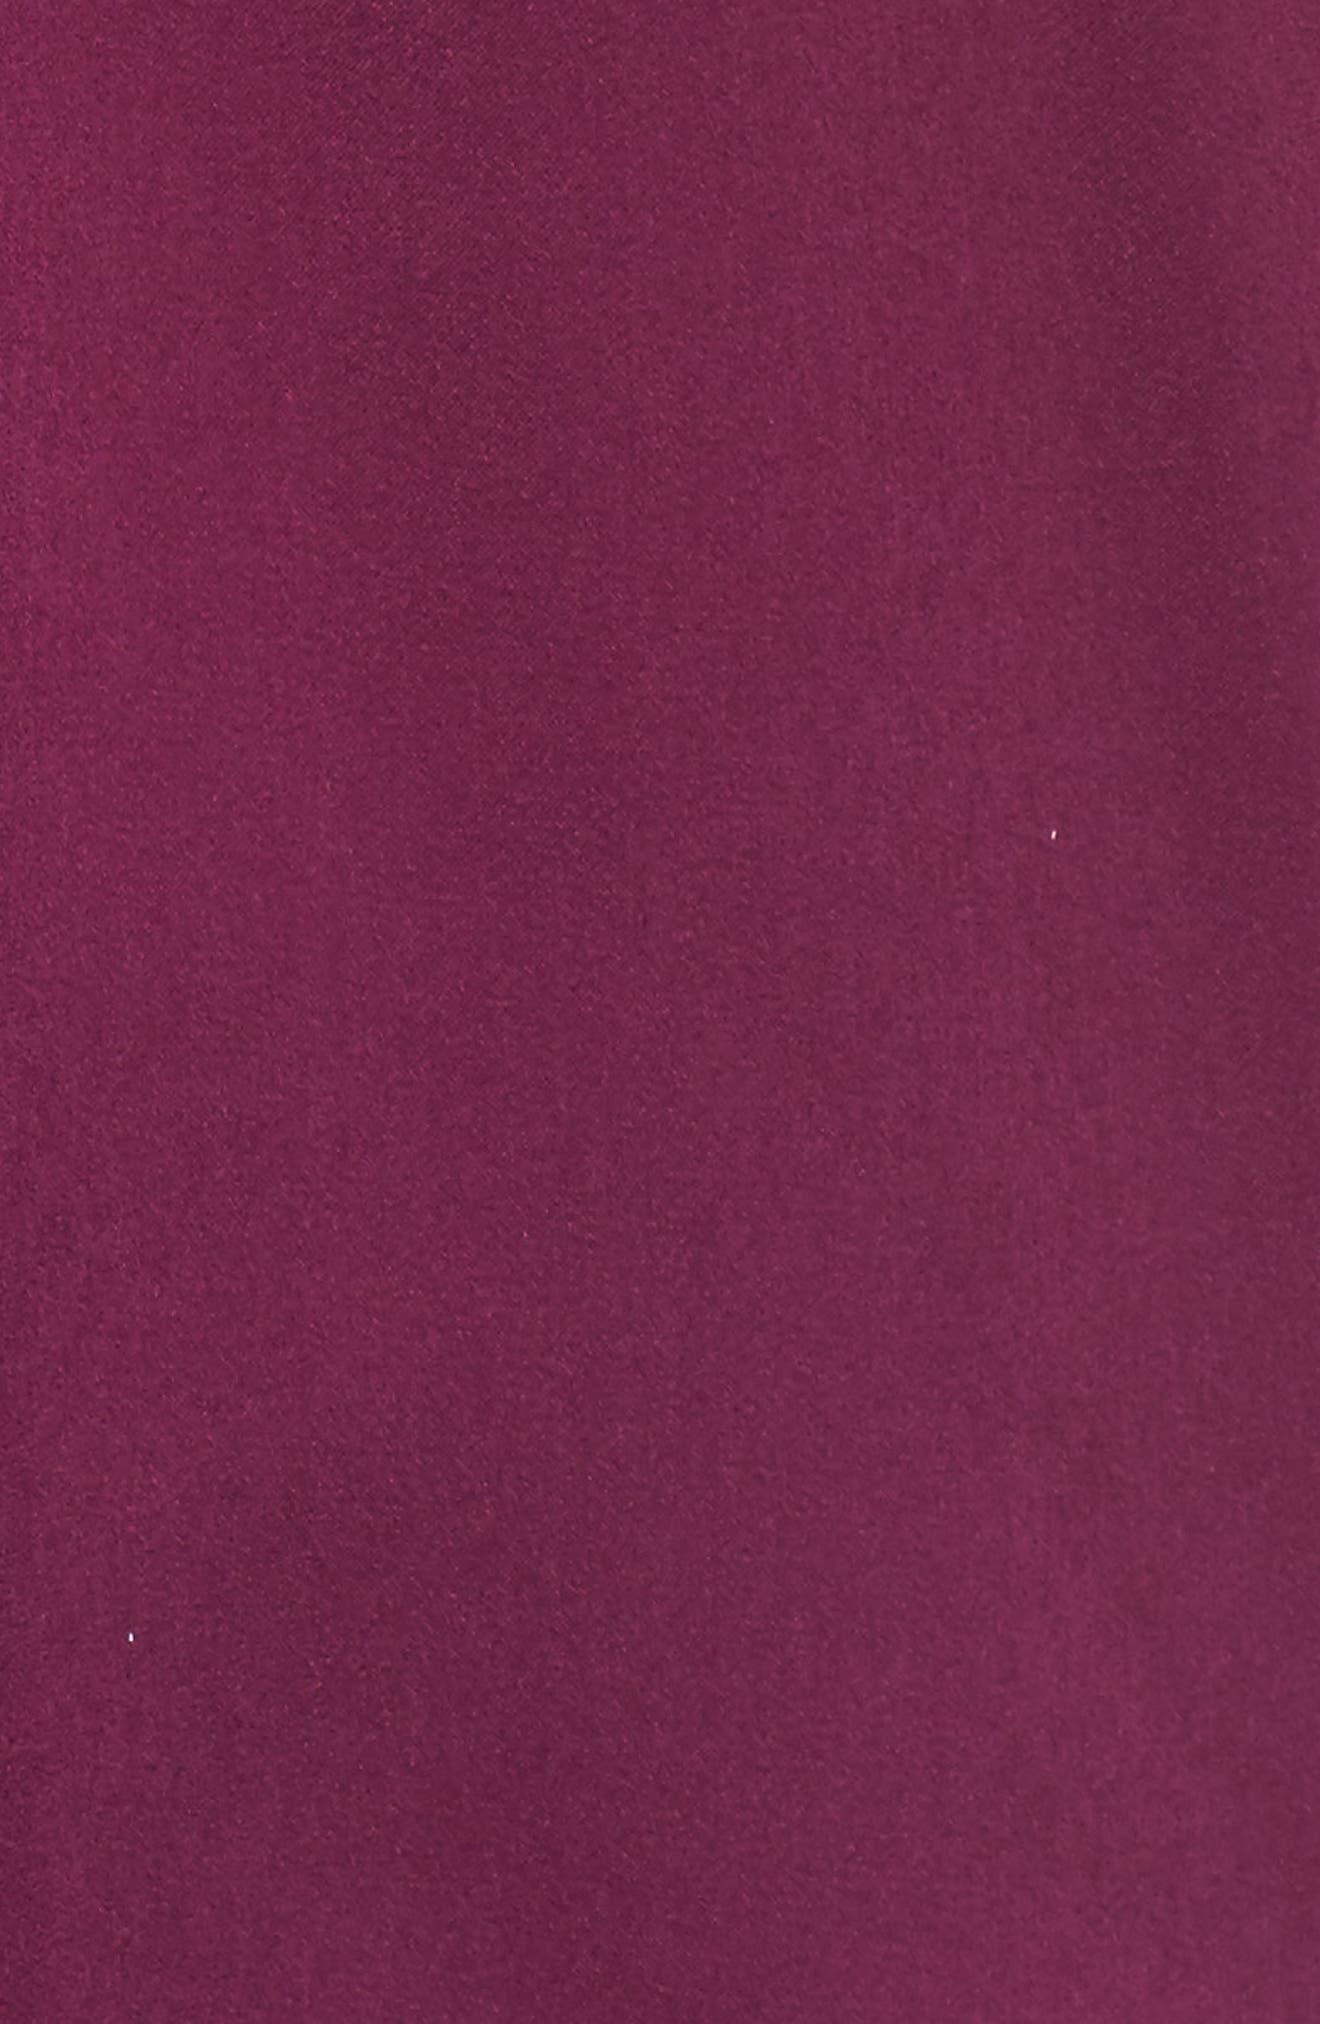 Asymmetrical Ruffle Top,                             Alternate thumbnail 5, color,